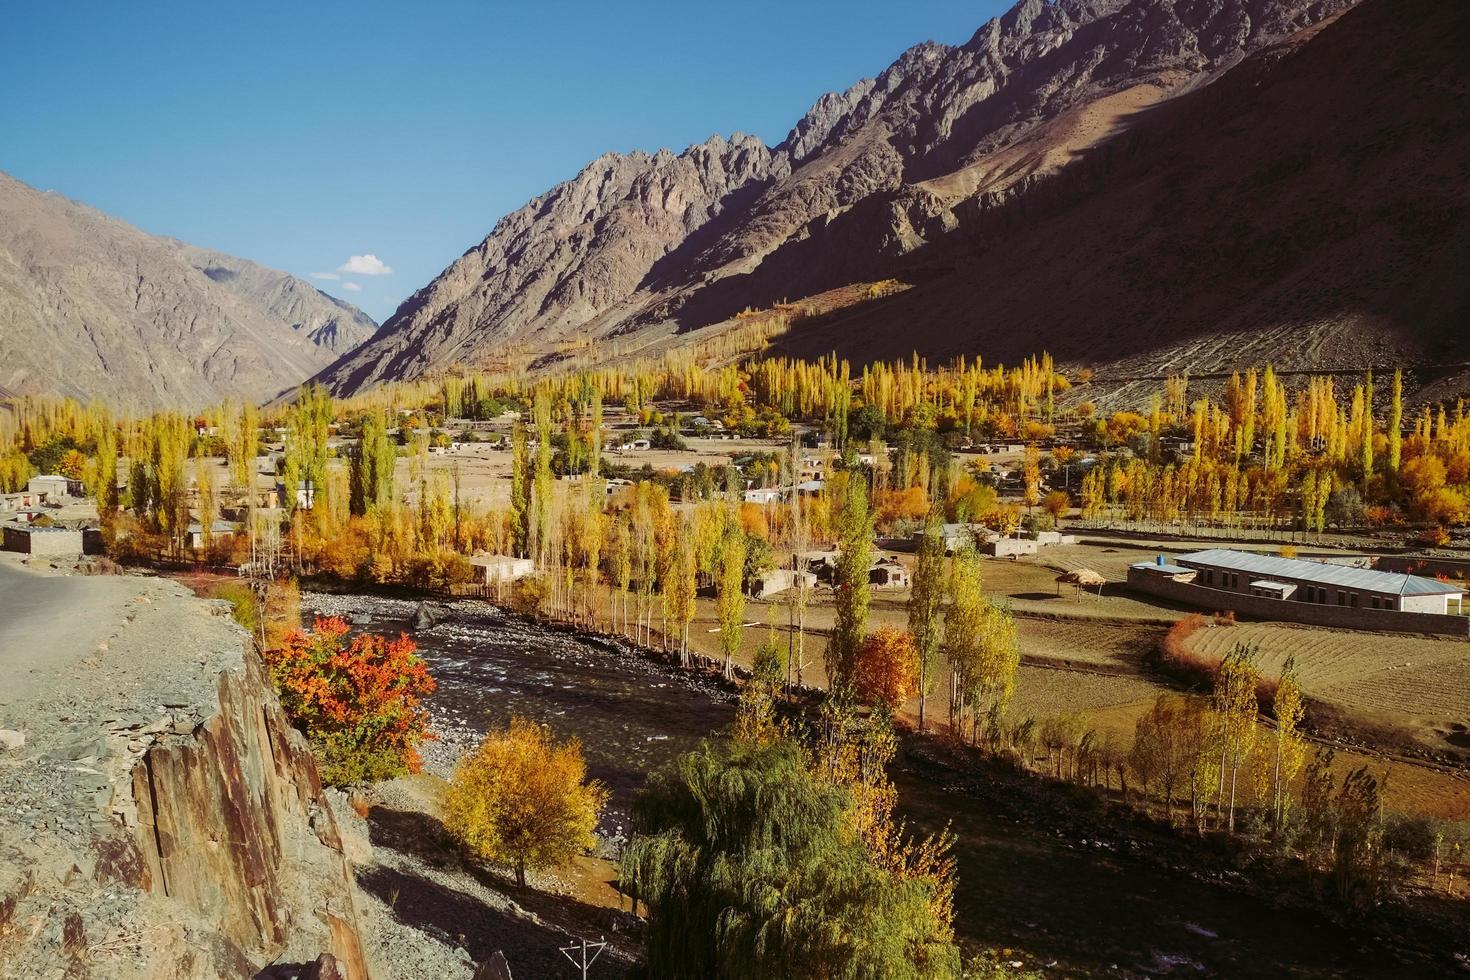 Autumn landscape view in Gupis valley, Pakistan photo